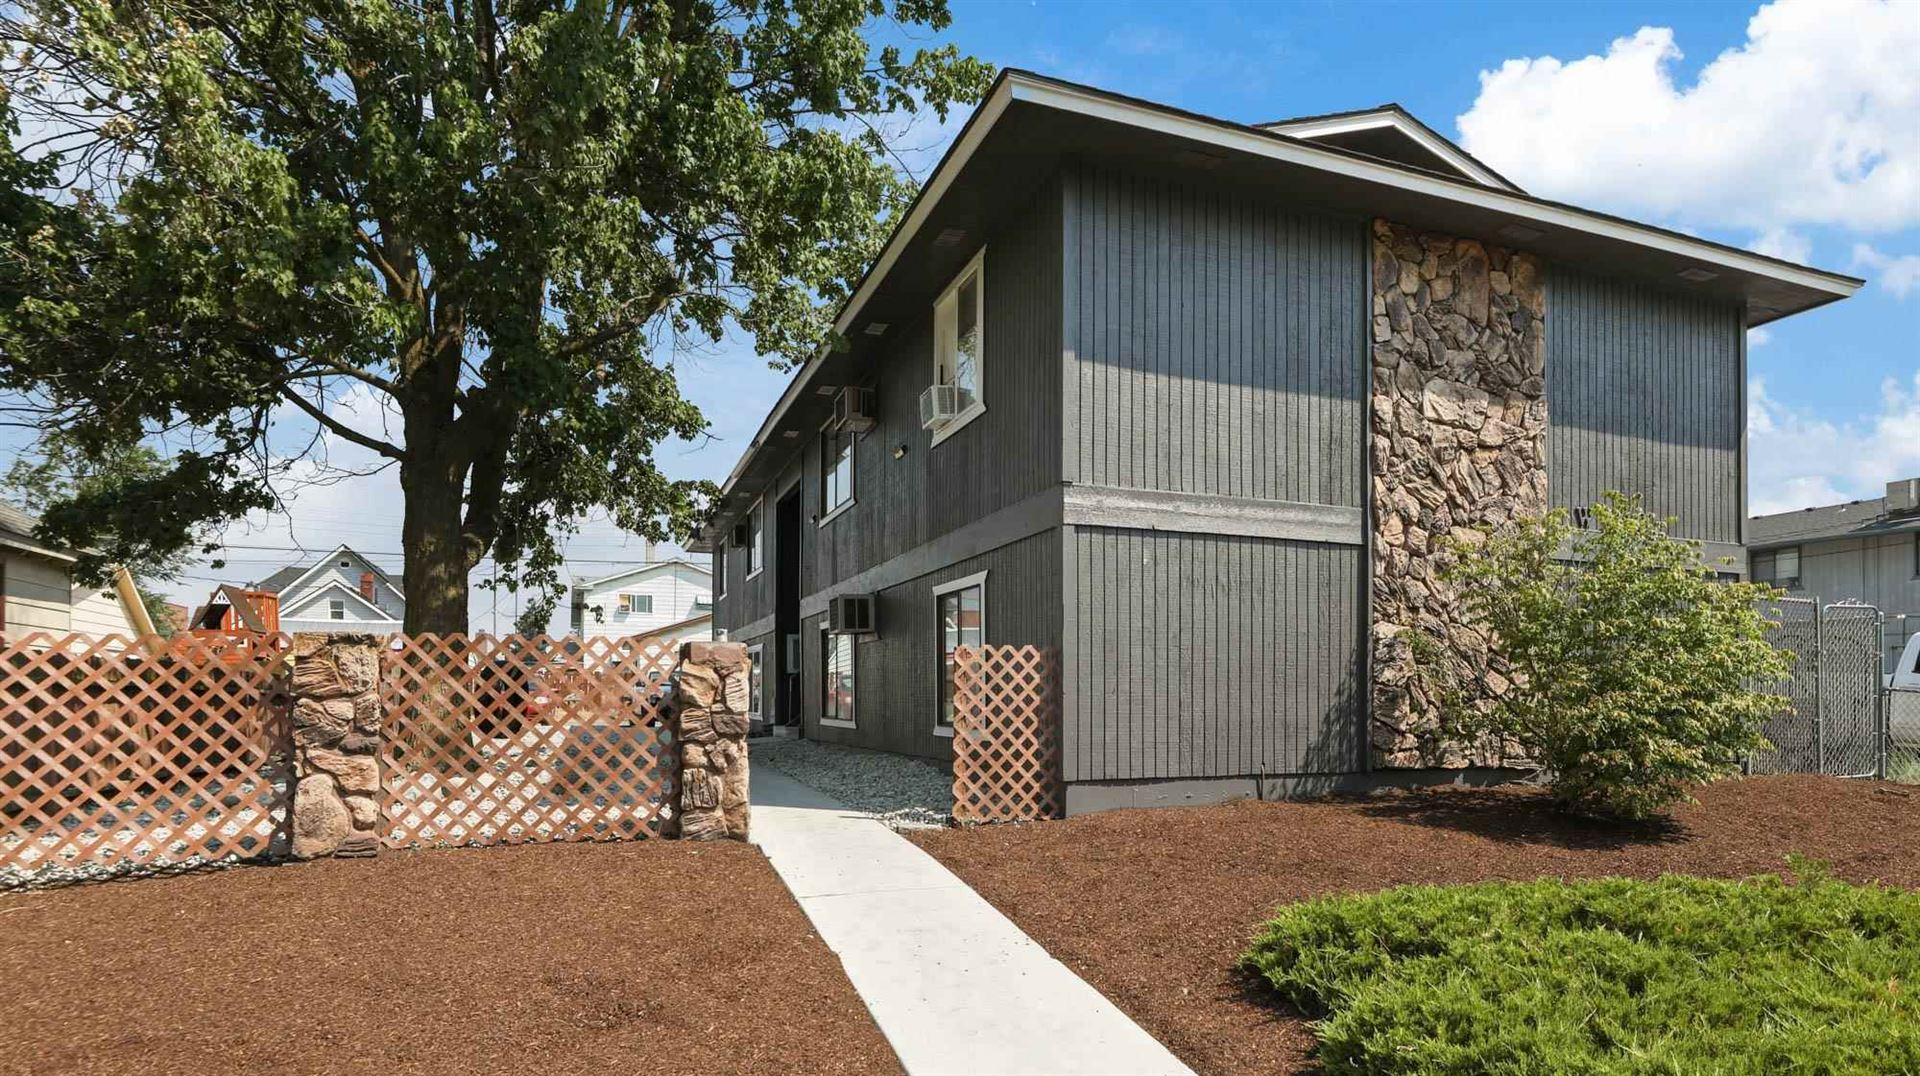 Photo of 1718 W Boone Ave, Spokane, WA 99201 (MLS # 202119484)